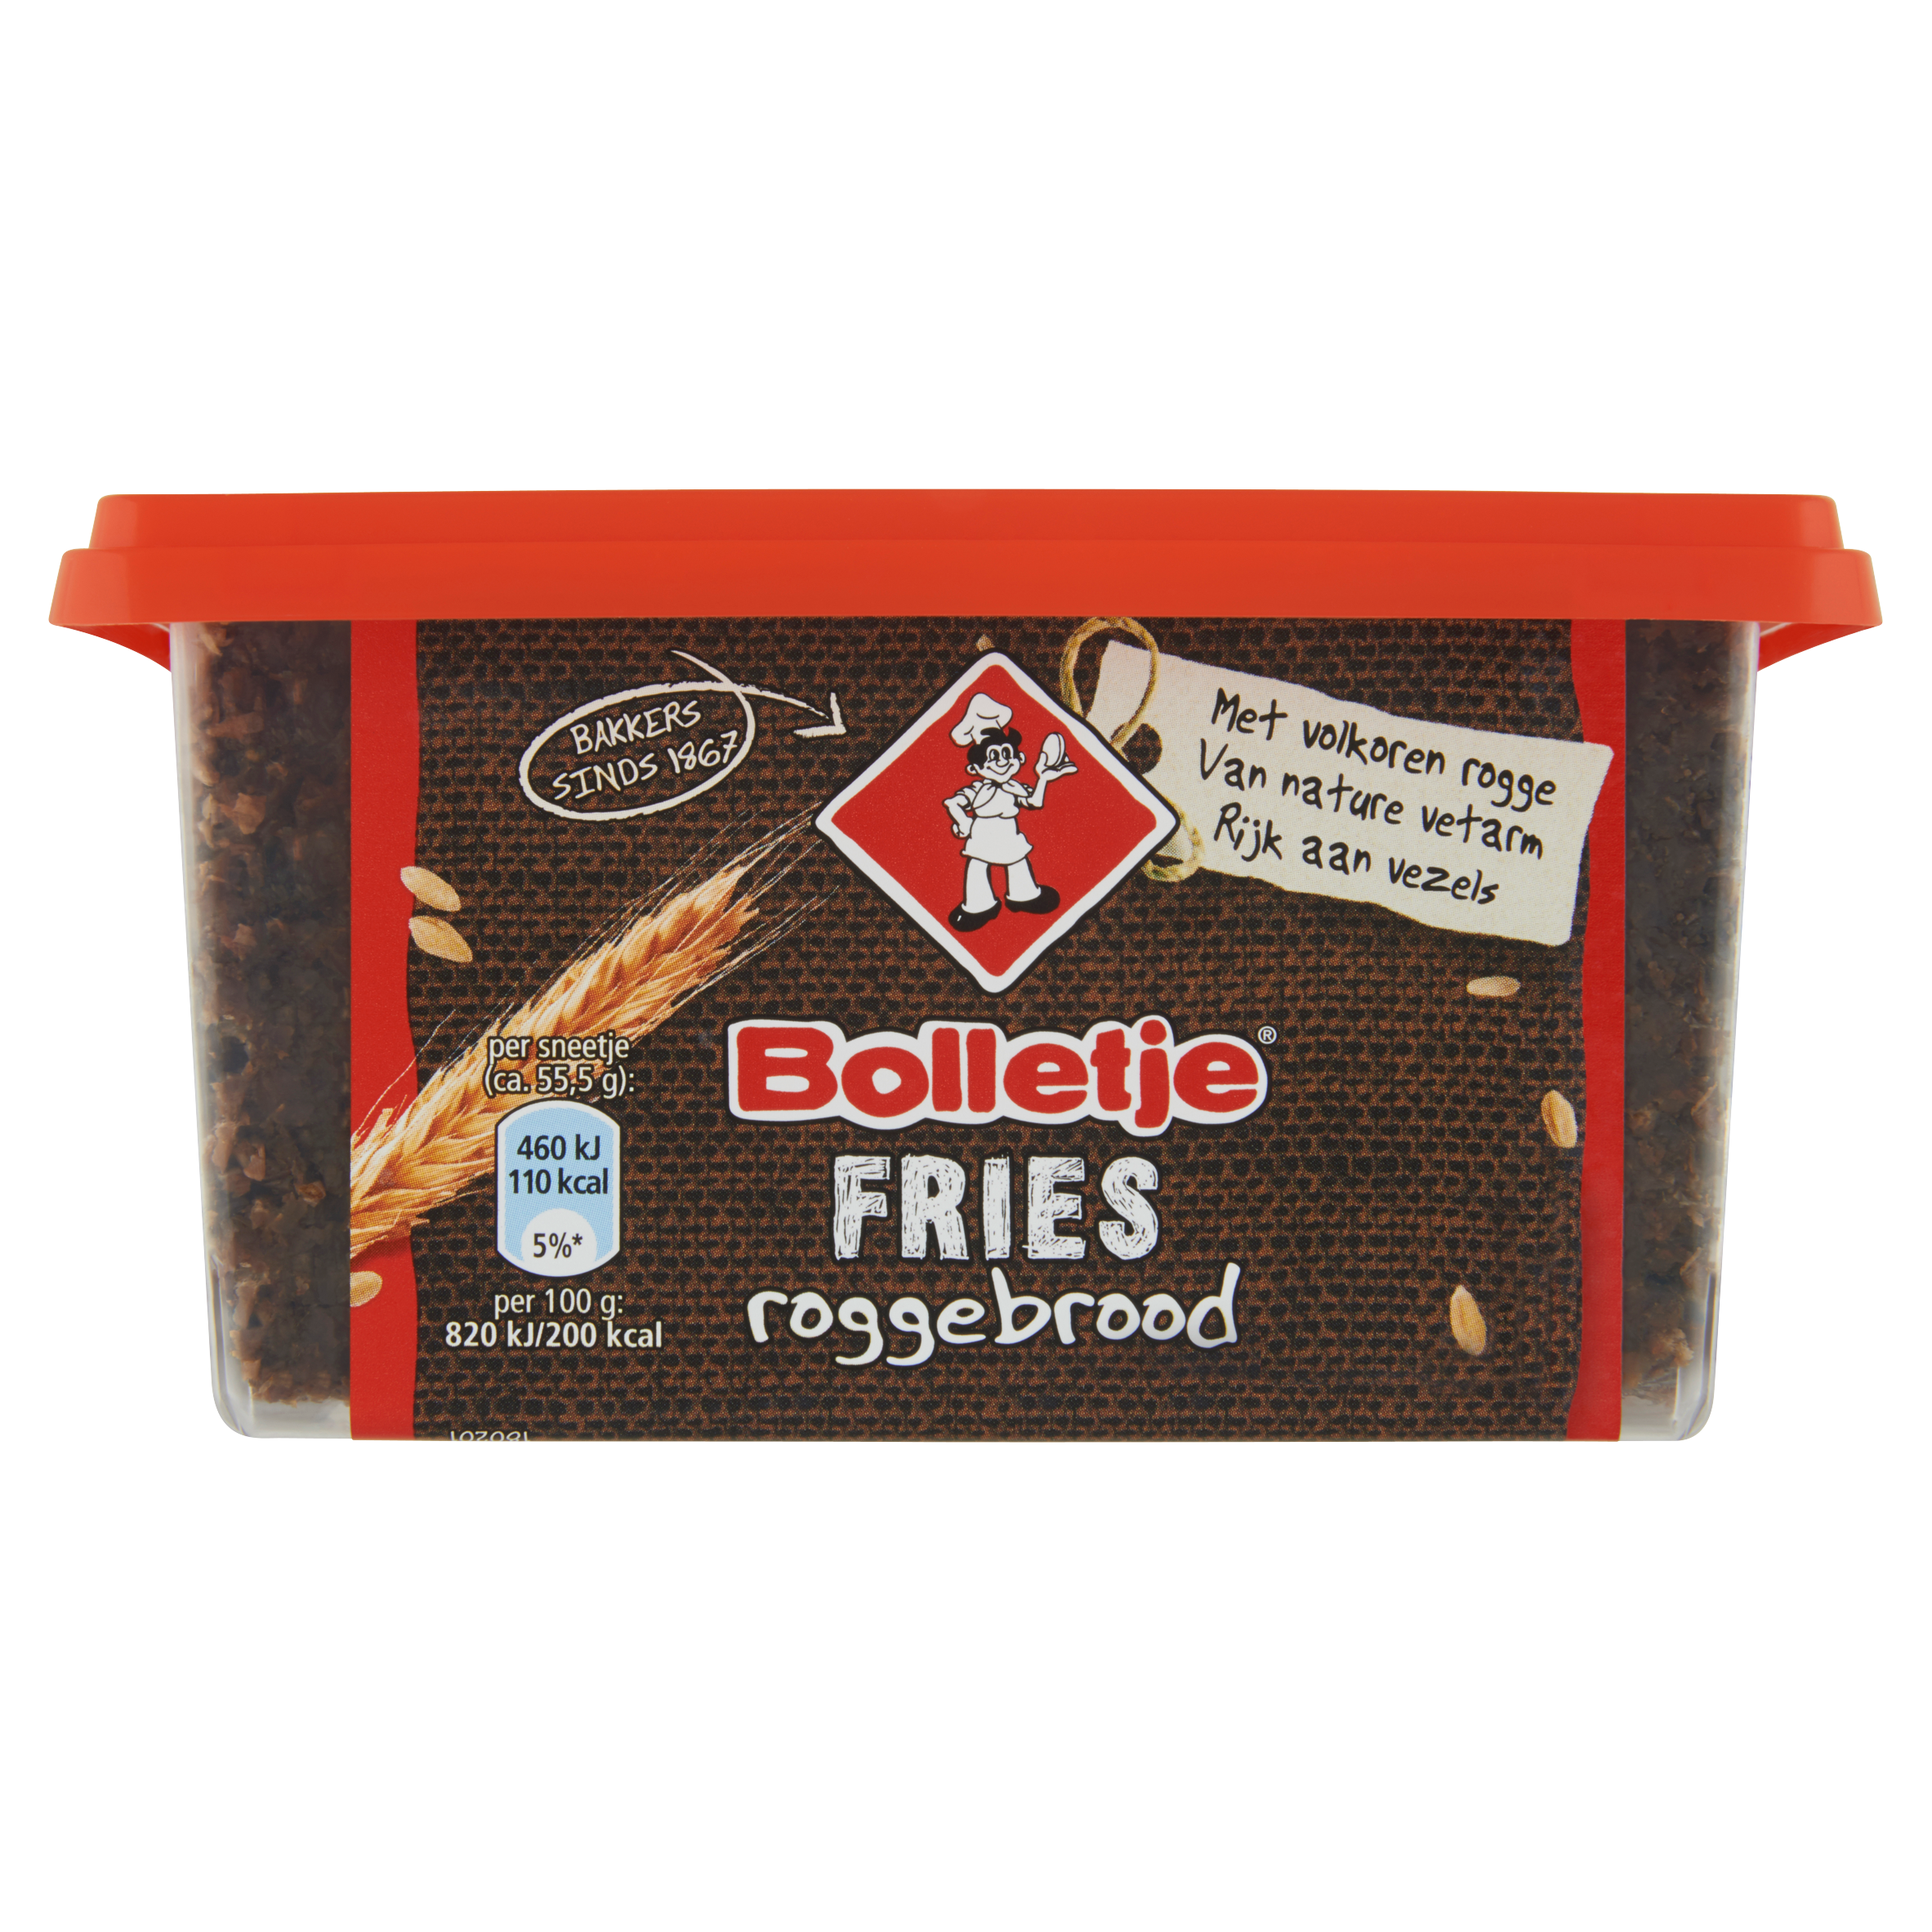 Bolletje Fries Roggebrood 500 g